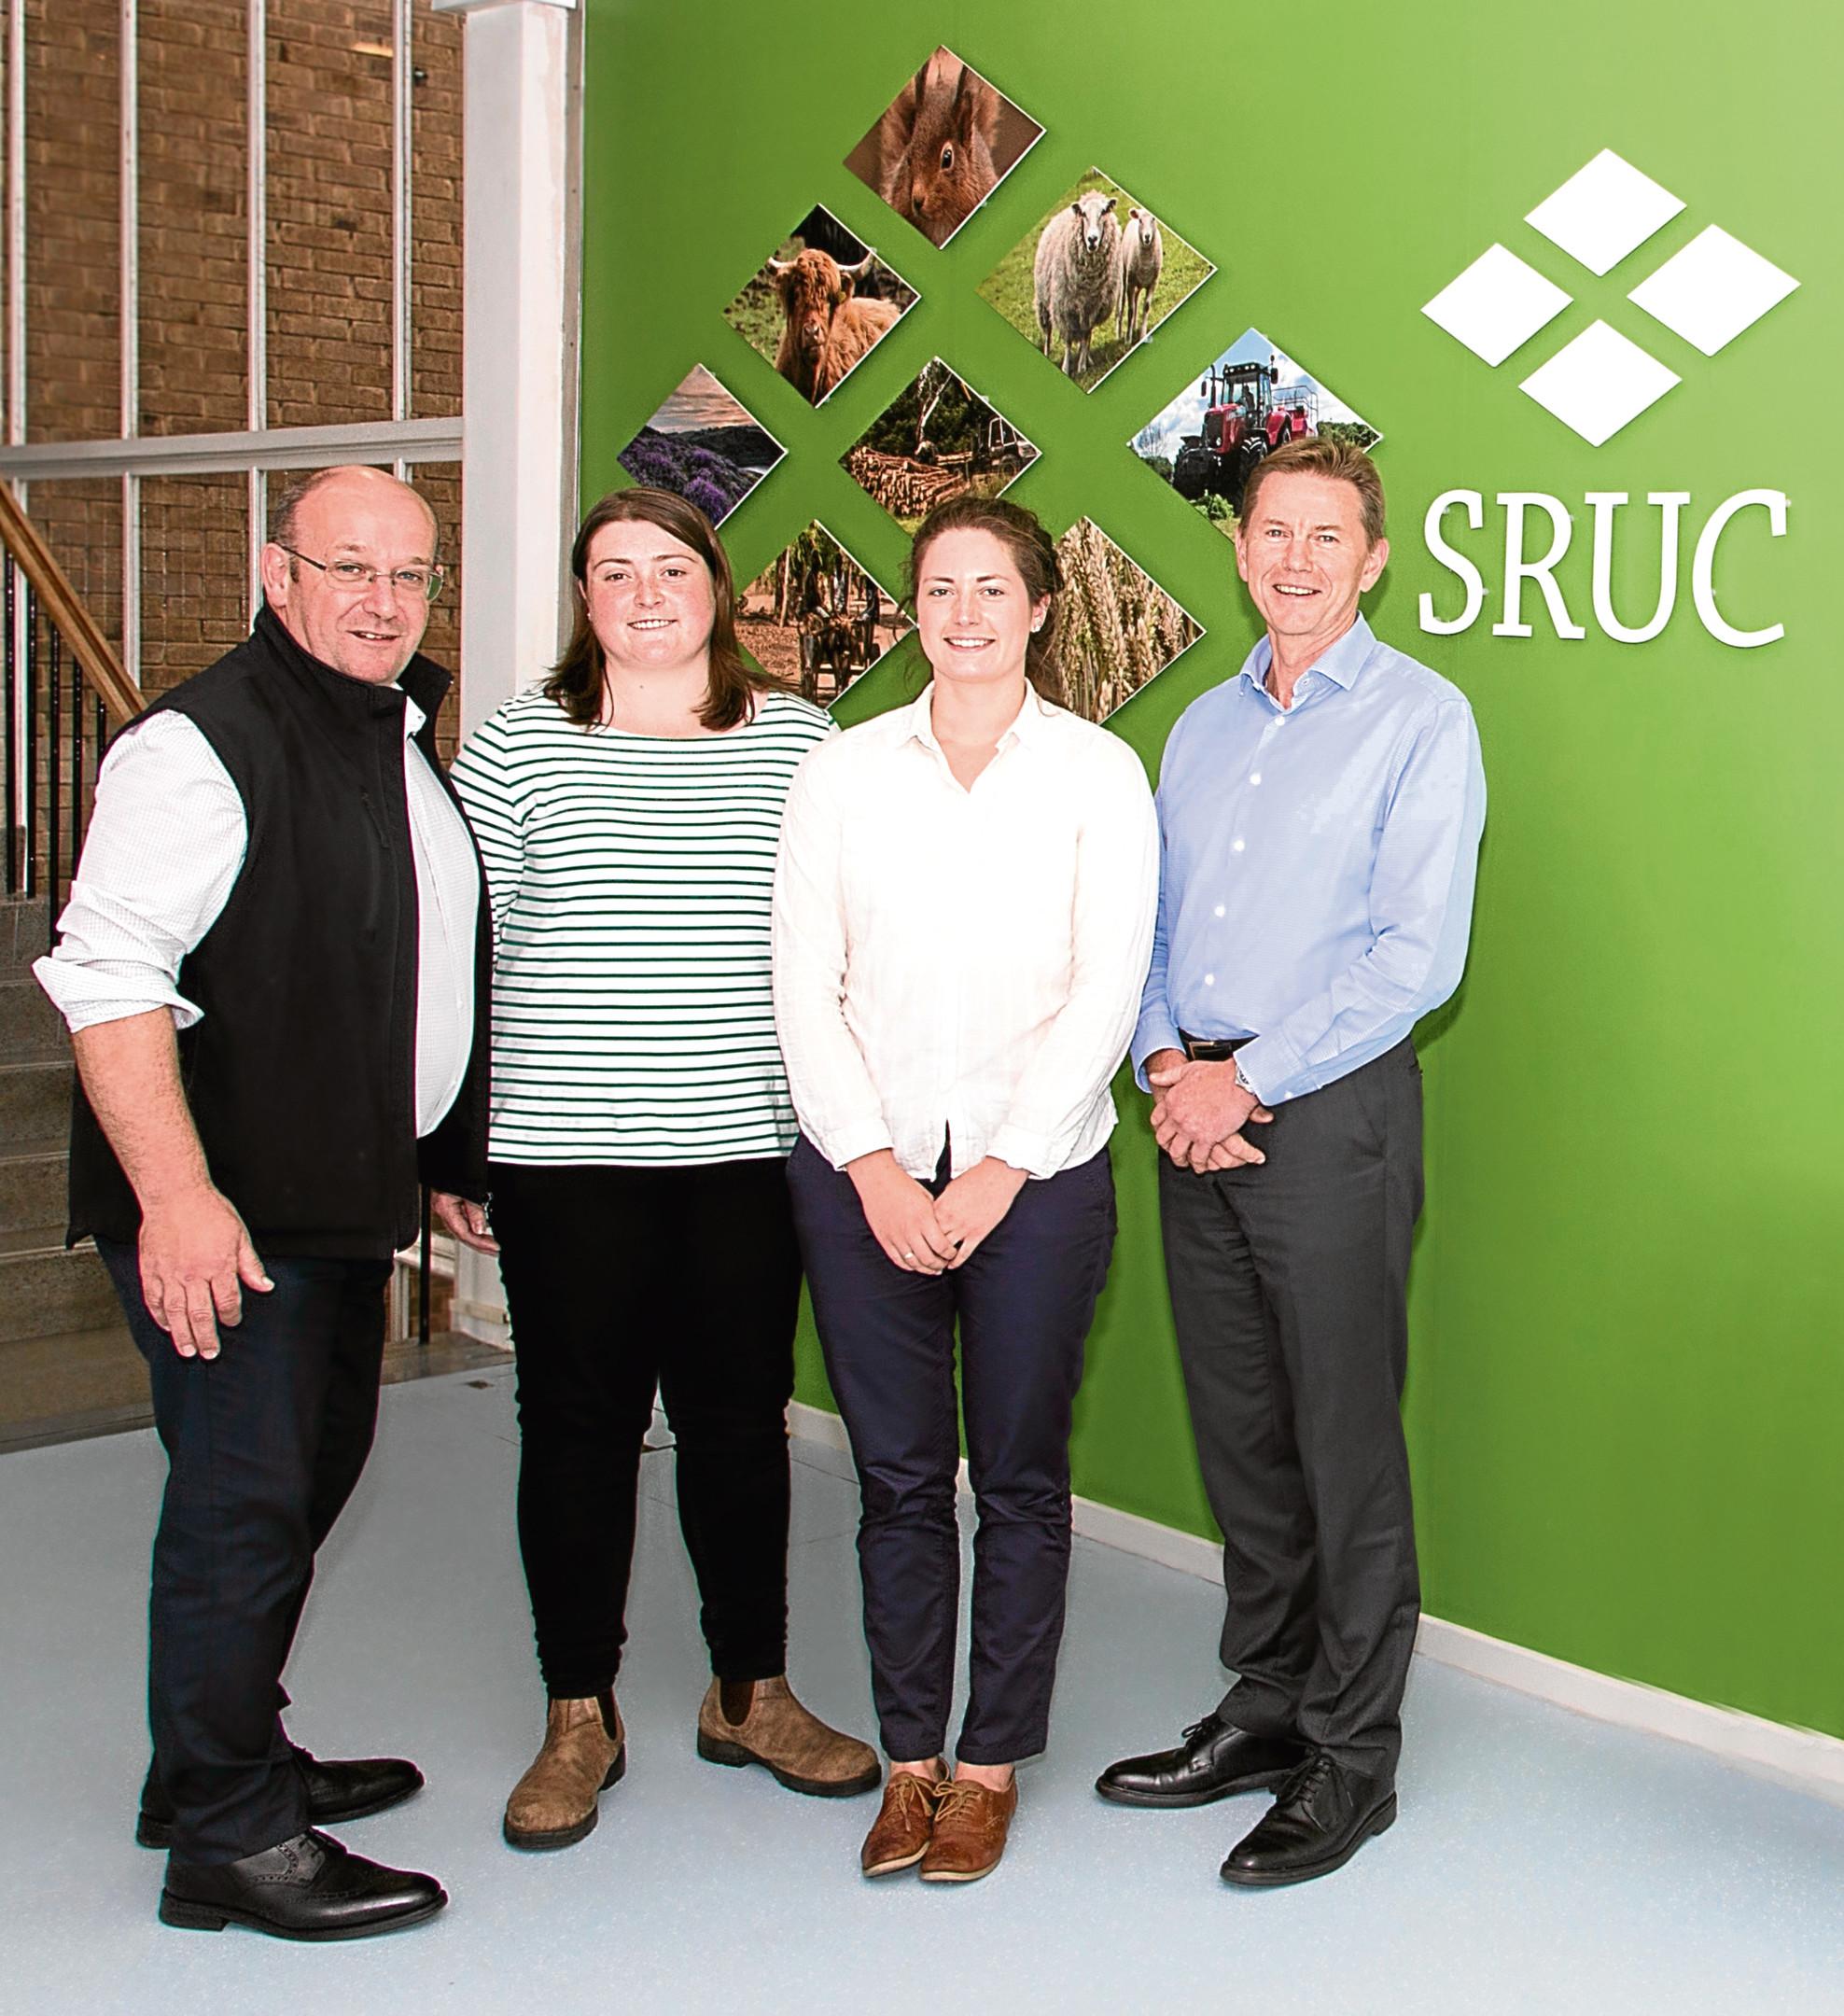 SAC Consulting's George Baikie, Iona Brisbane, Maimie Sloan and Mike Wijnberg